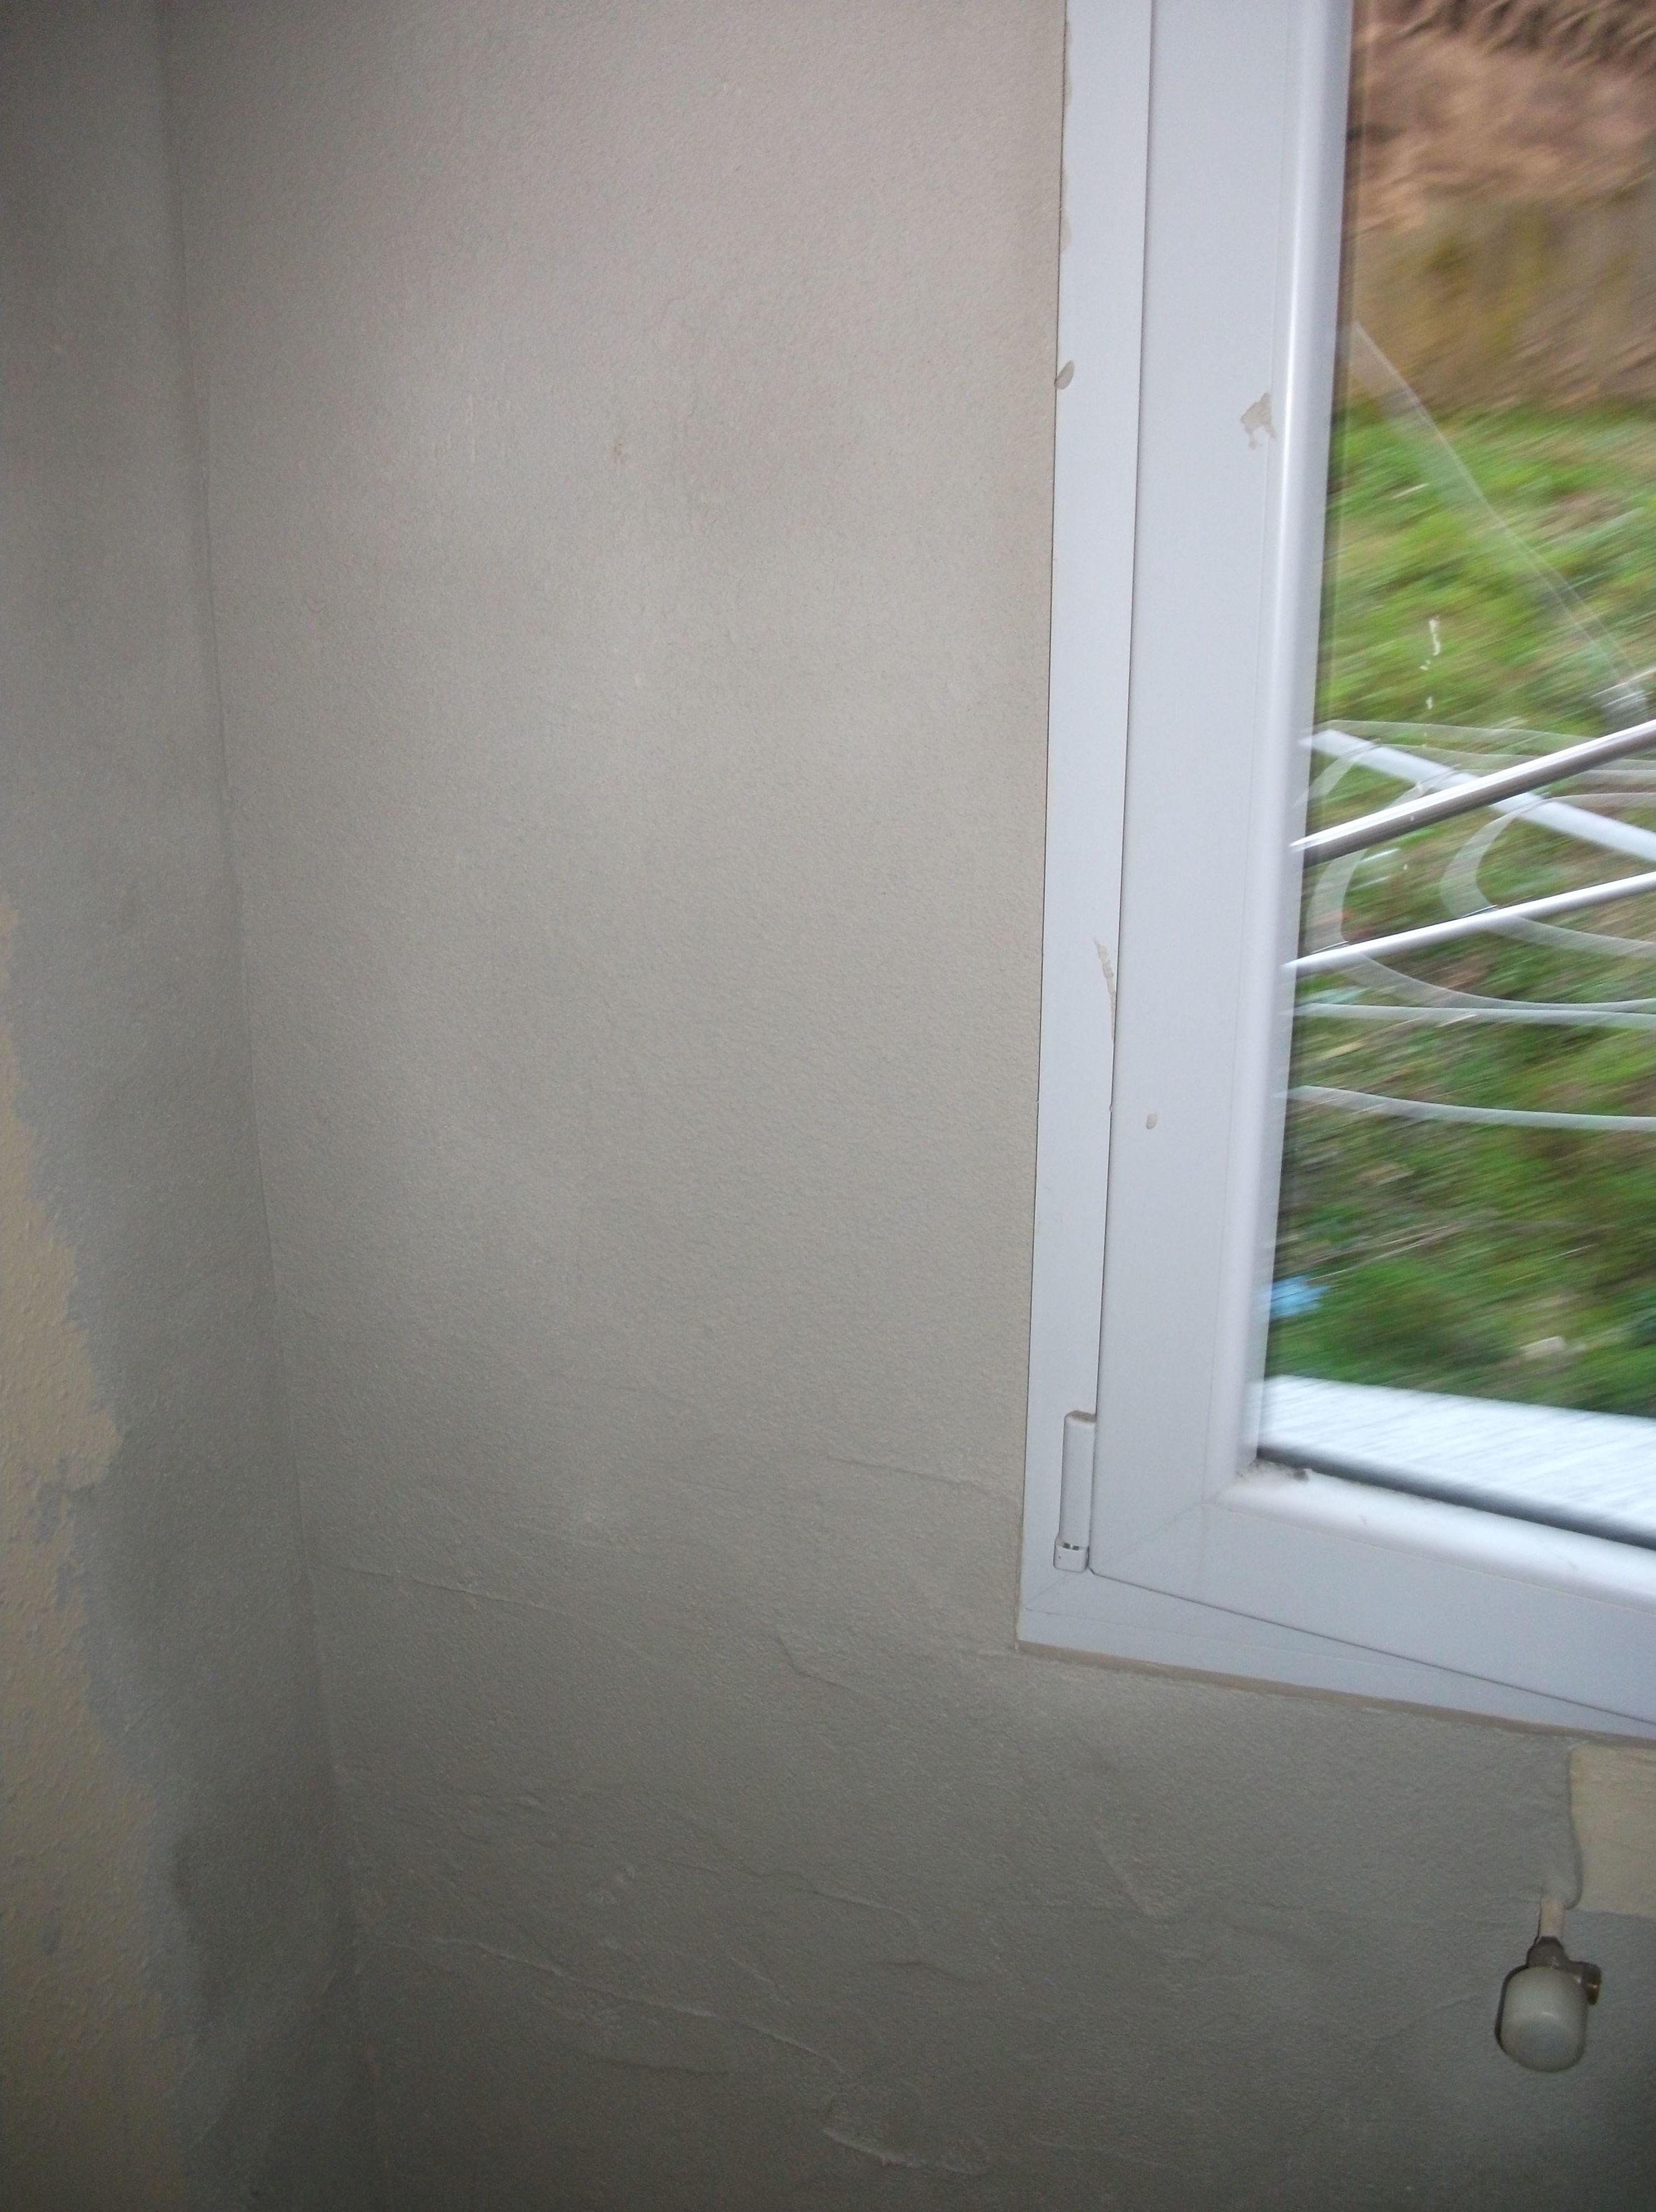 Eliminación de moho en pared